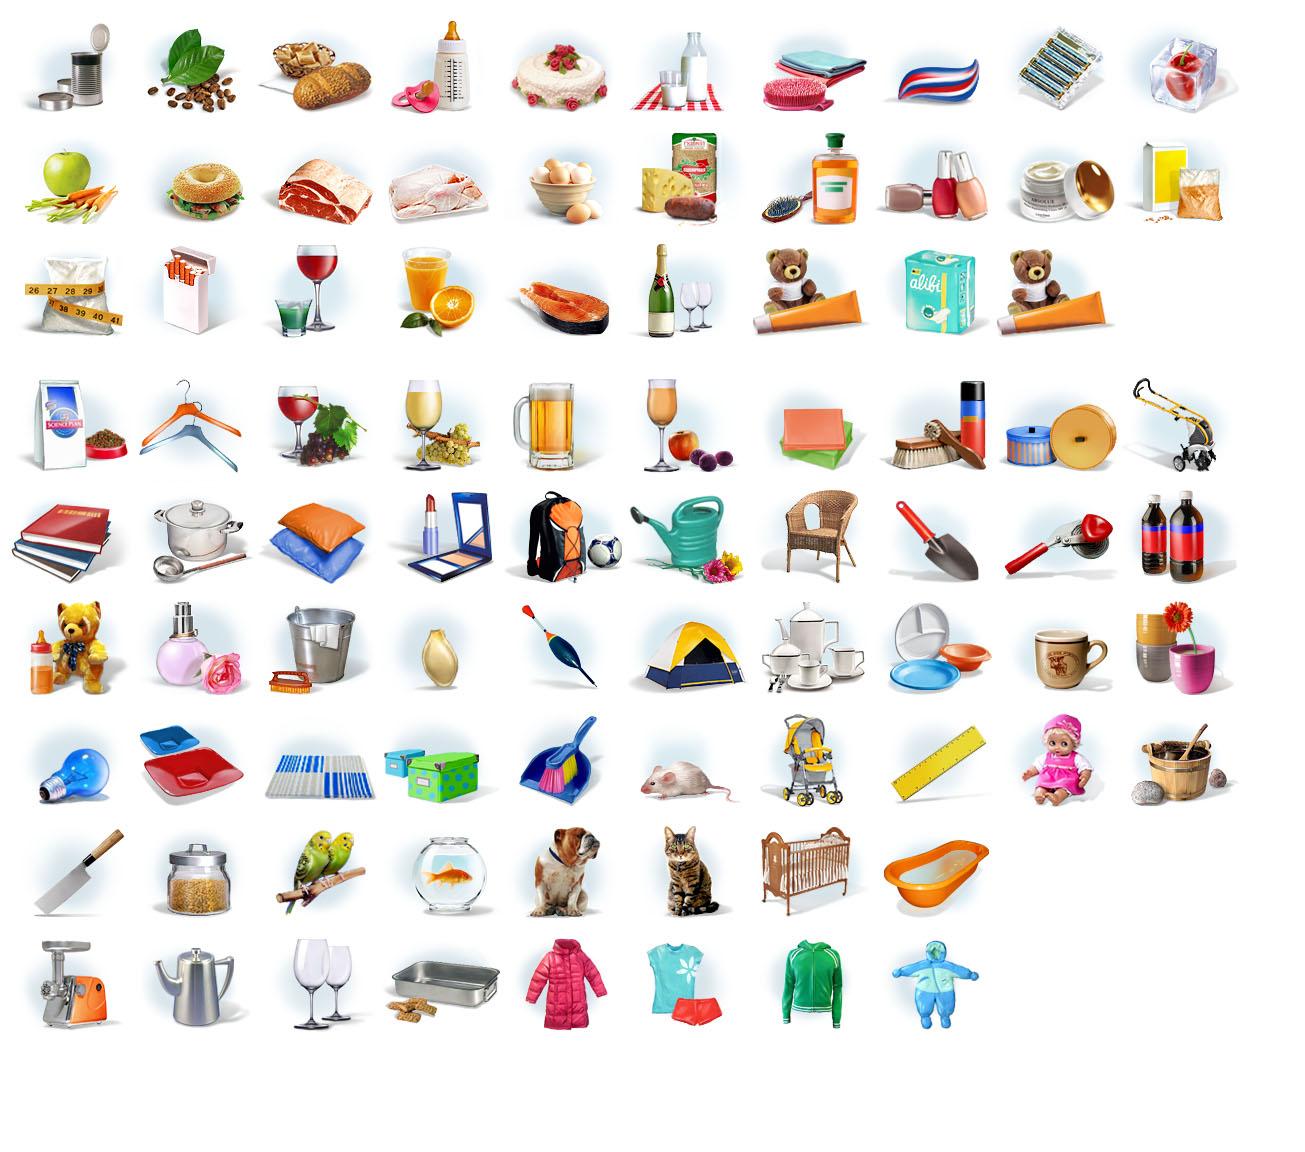 icons for some e-shop